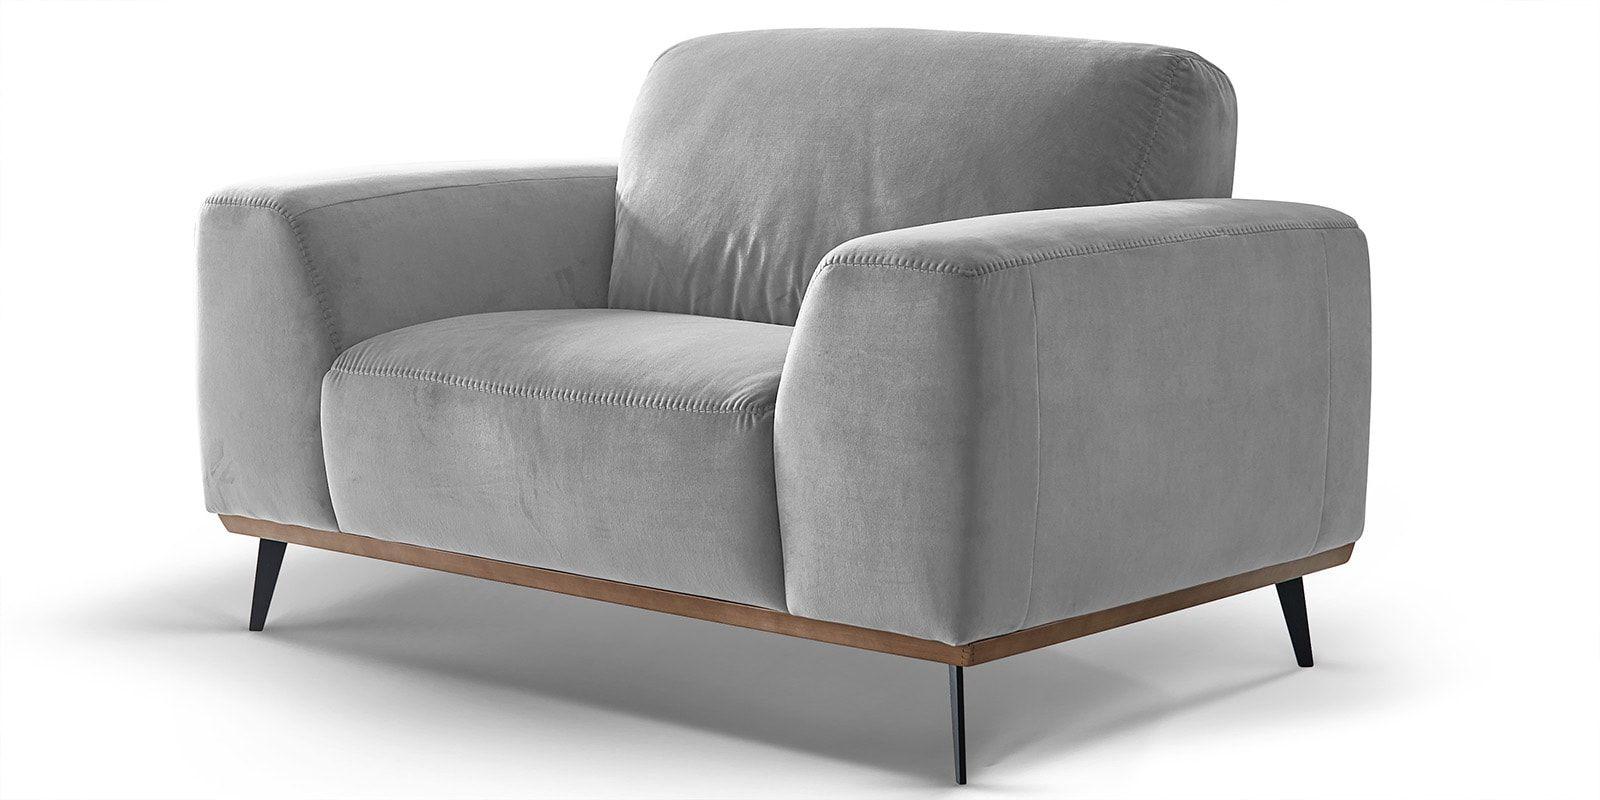 Skandi Design 1 5 Sitzer Couch Mit Holzrahmen Barcelona Comfort2home Sessel Holz Design